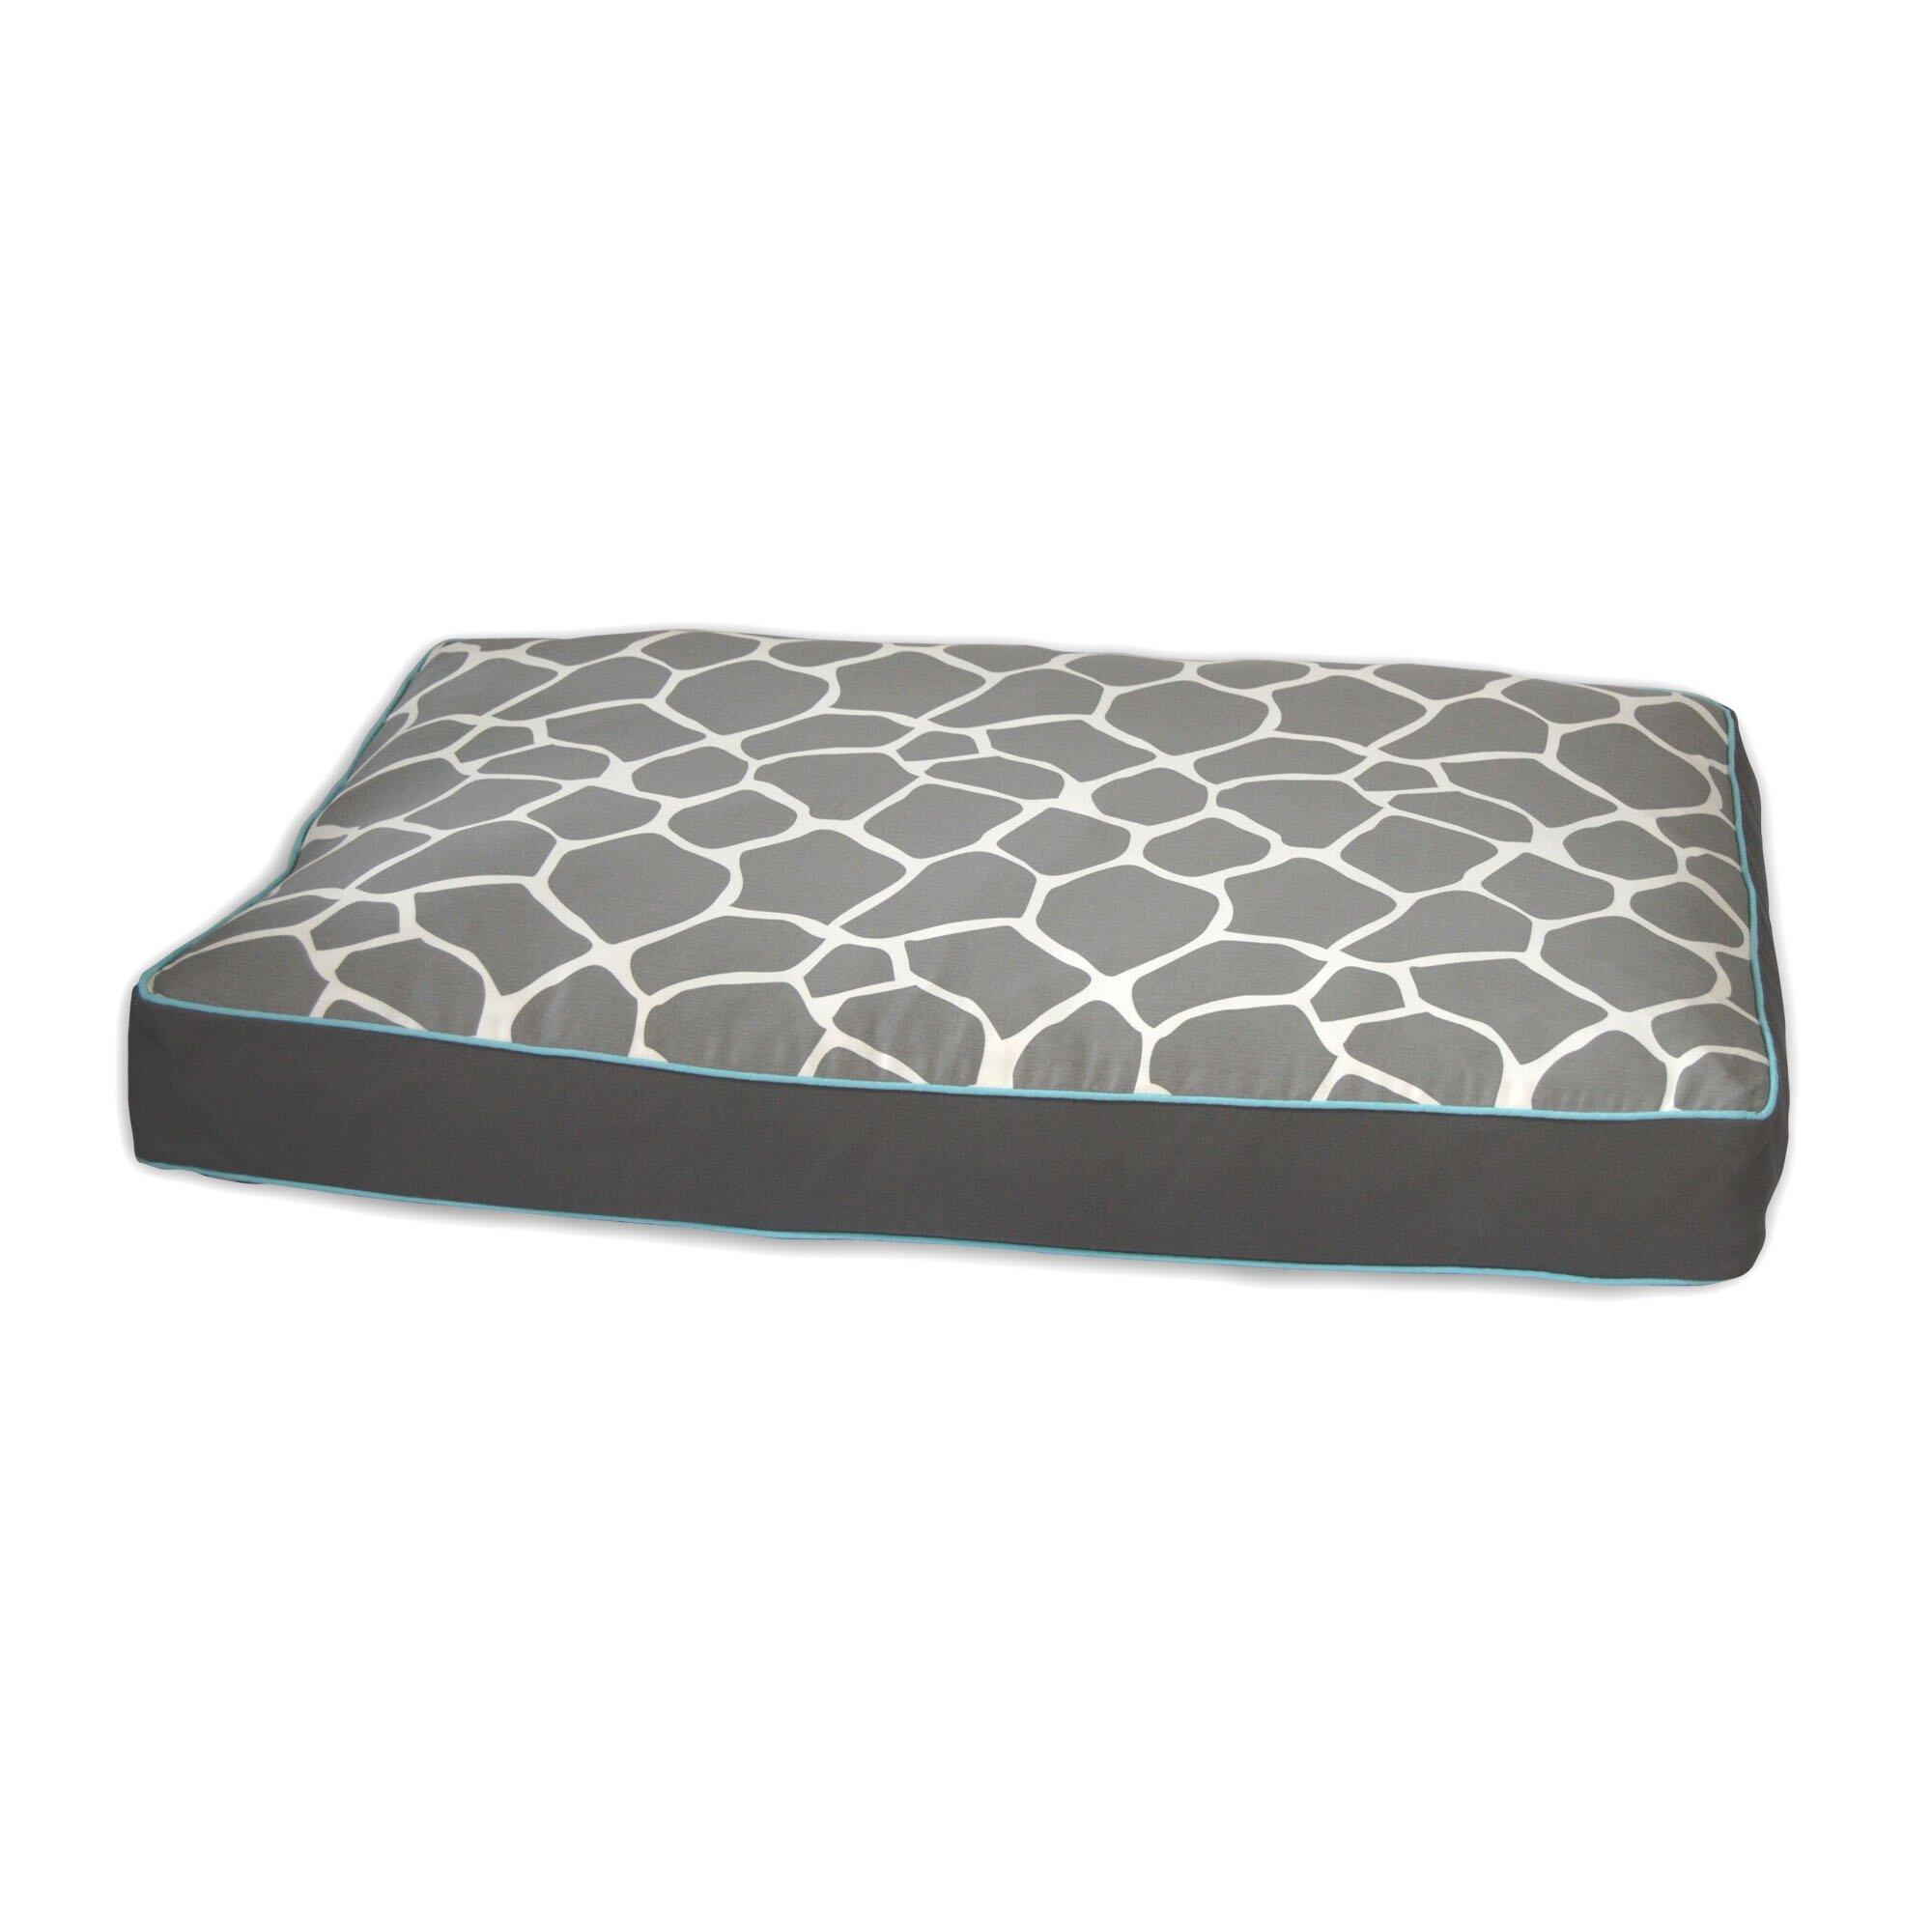 EZ Living Home Giraffe Memory Foam Topper Pet Bed Reviews Wayfair